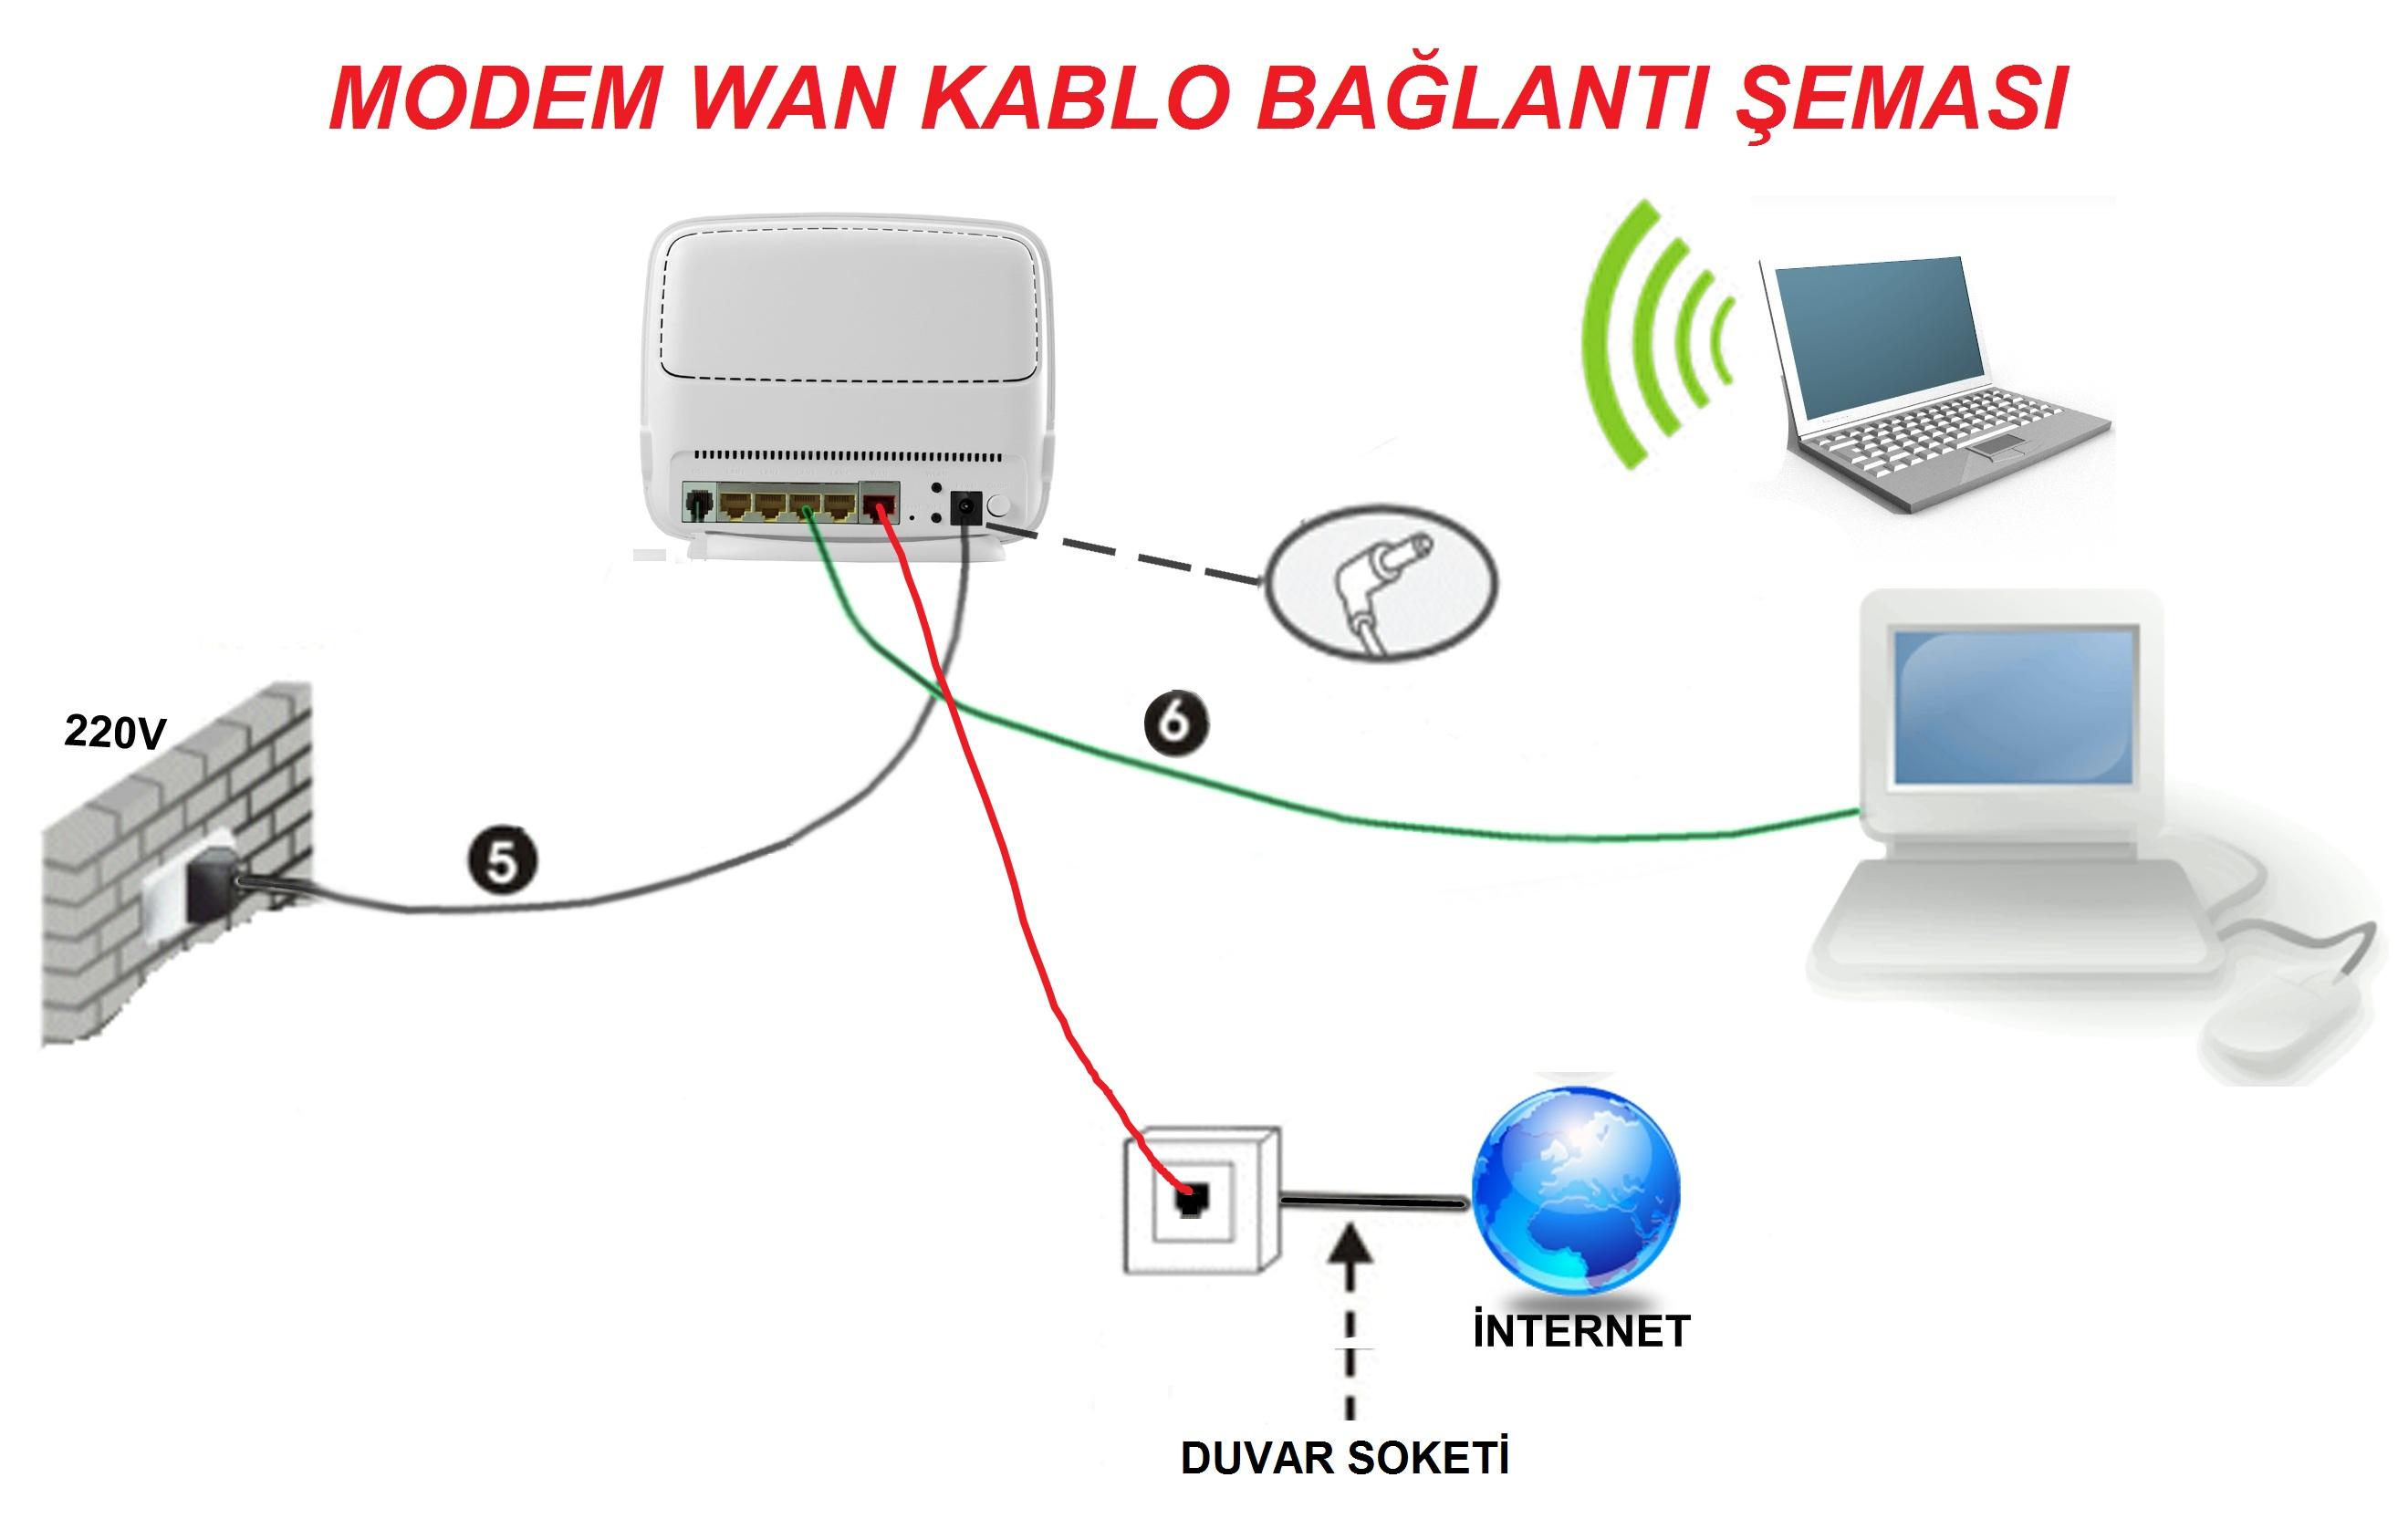 Türk Telekom Modem Tp Link